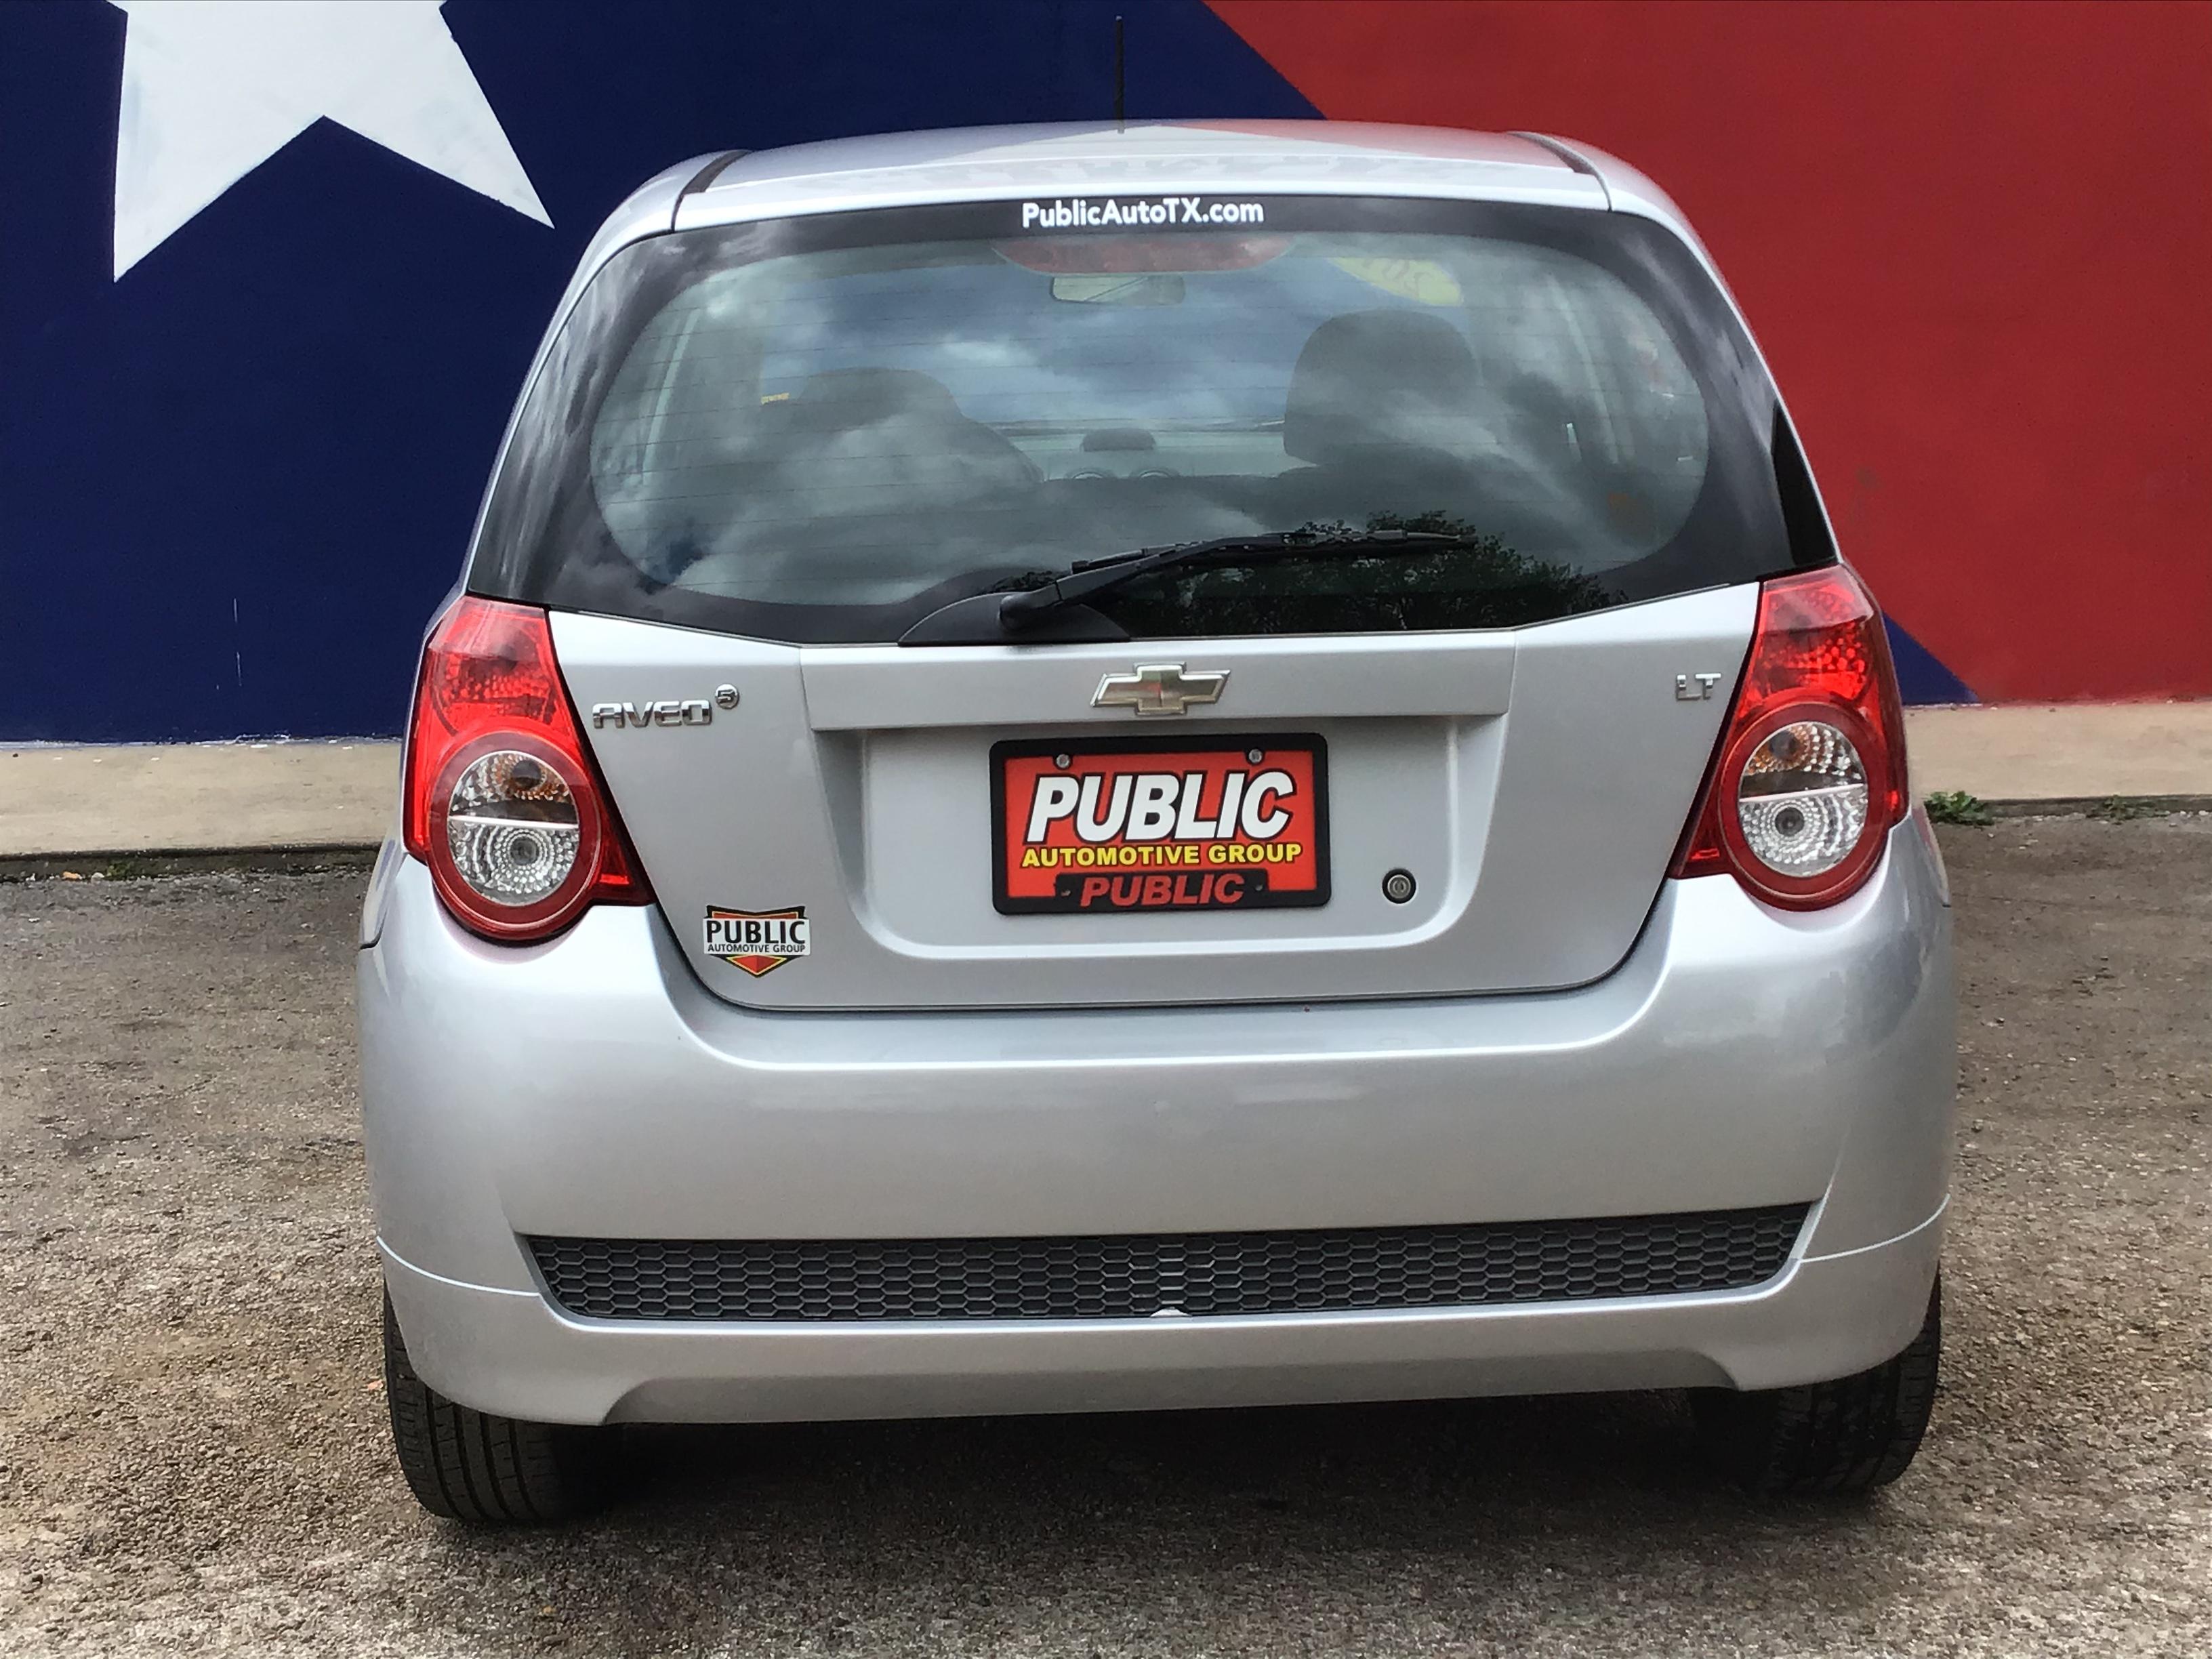 used vehicle - Hatchback CHEVROLET AVEO 2010